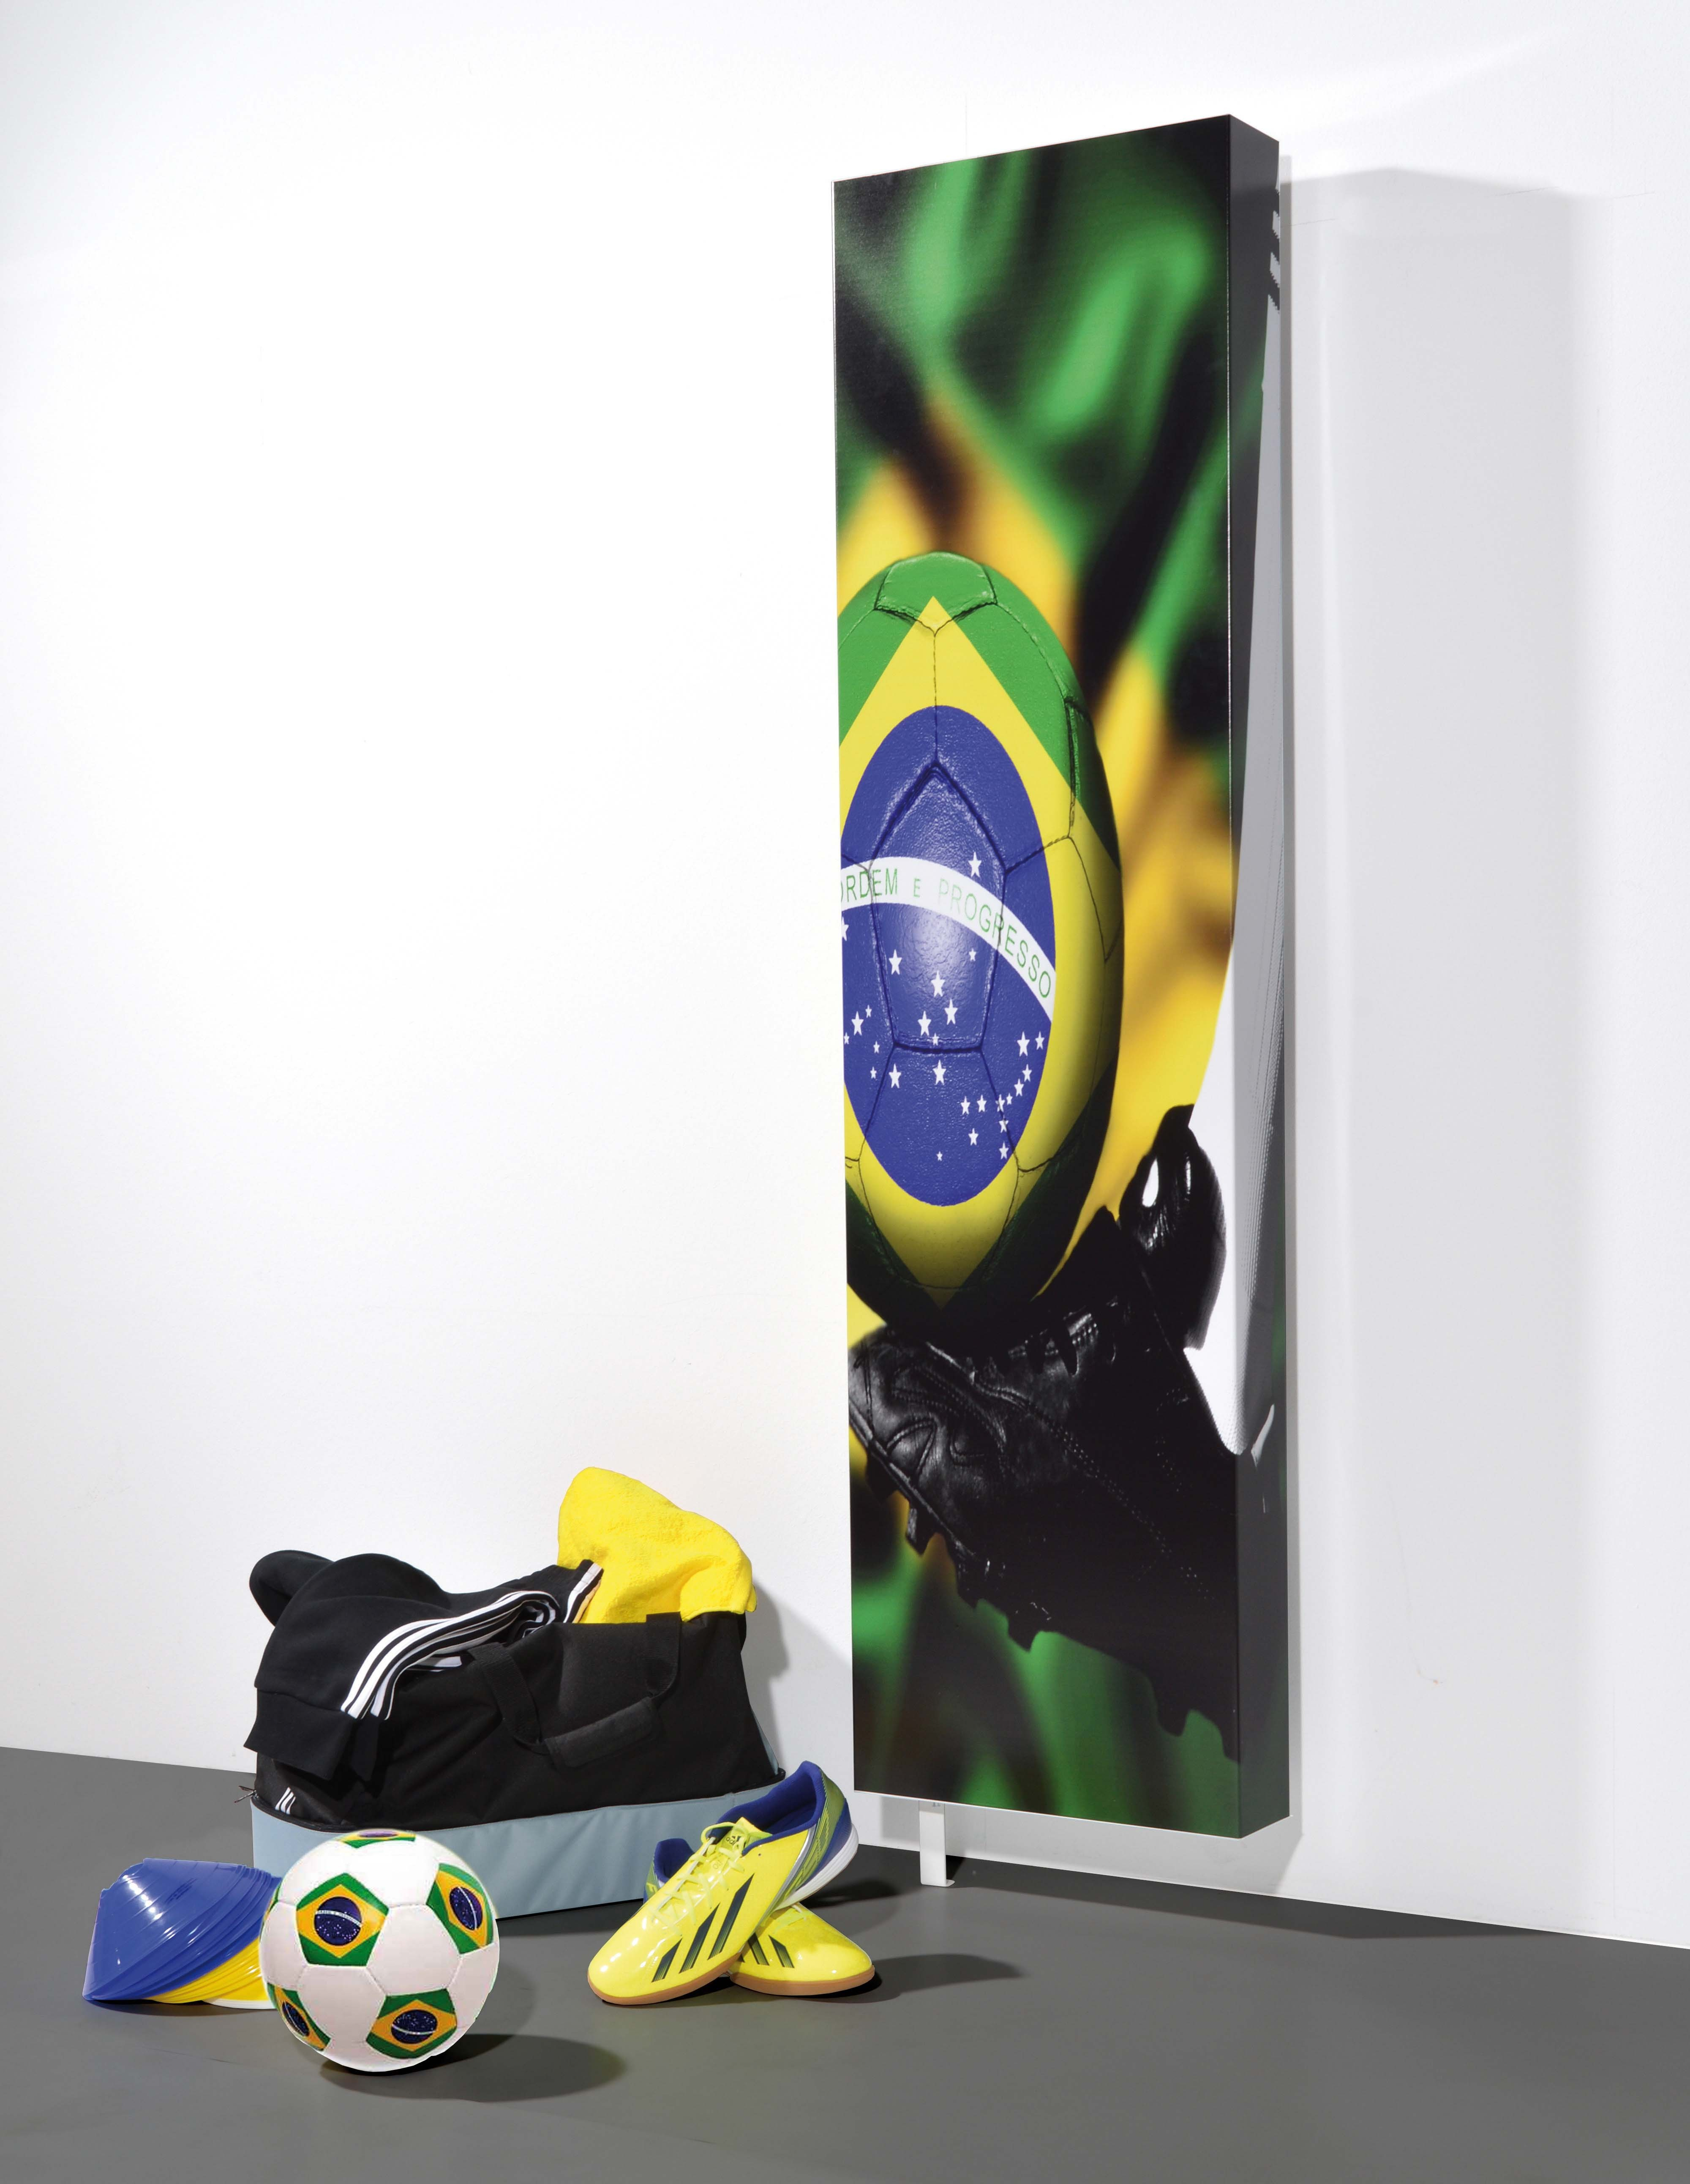 drehbarer schuhschrank mehrzweckschrank mod gm641 motiv brazil h c m bel. Black Bedroom Furniture Sets. Home Design Ideas